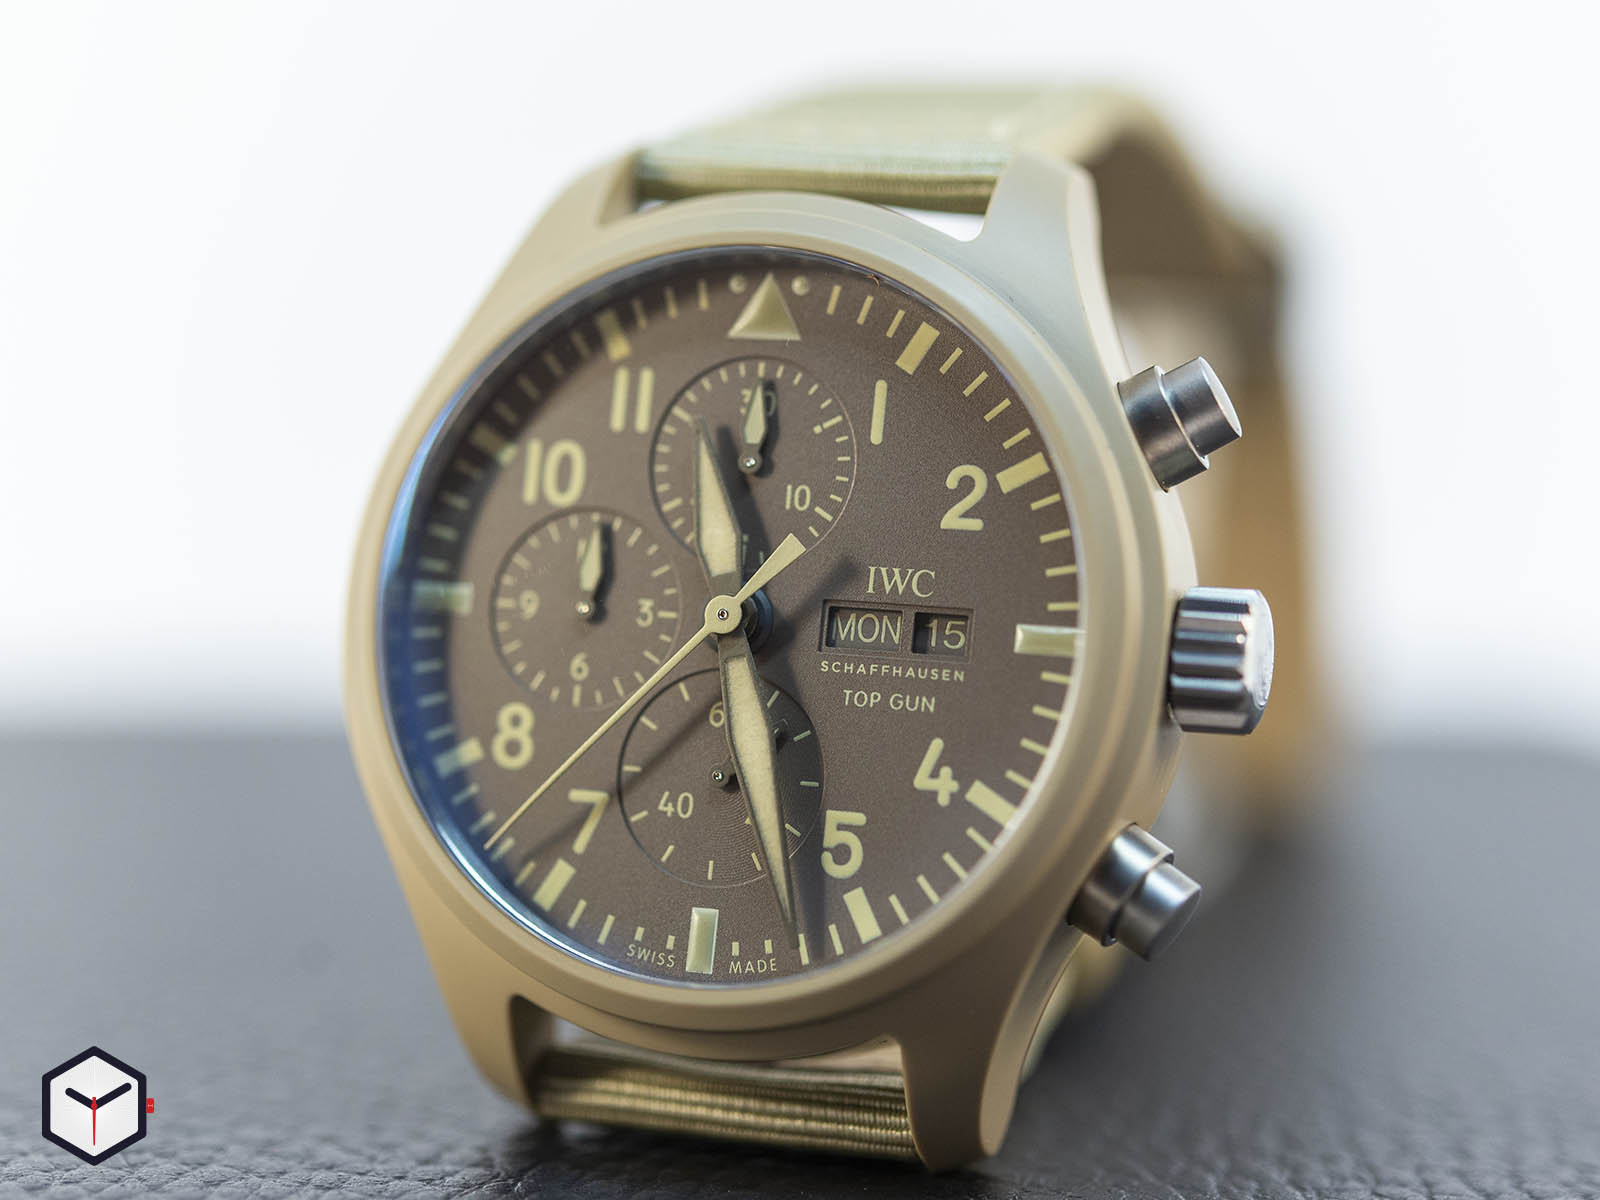 iw389103-iwc-pilot-s-watch-chronograph-top-gun-edition-mojave-desert-sihh-2019-3.jpg